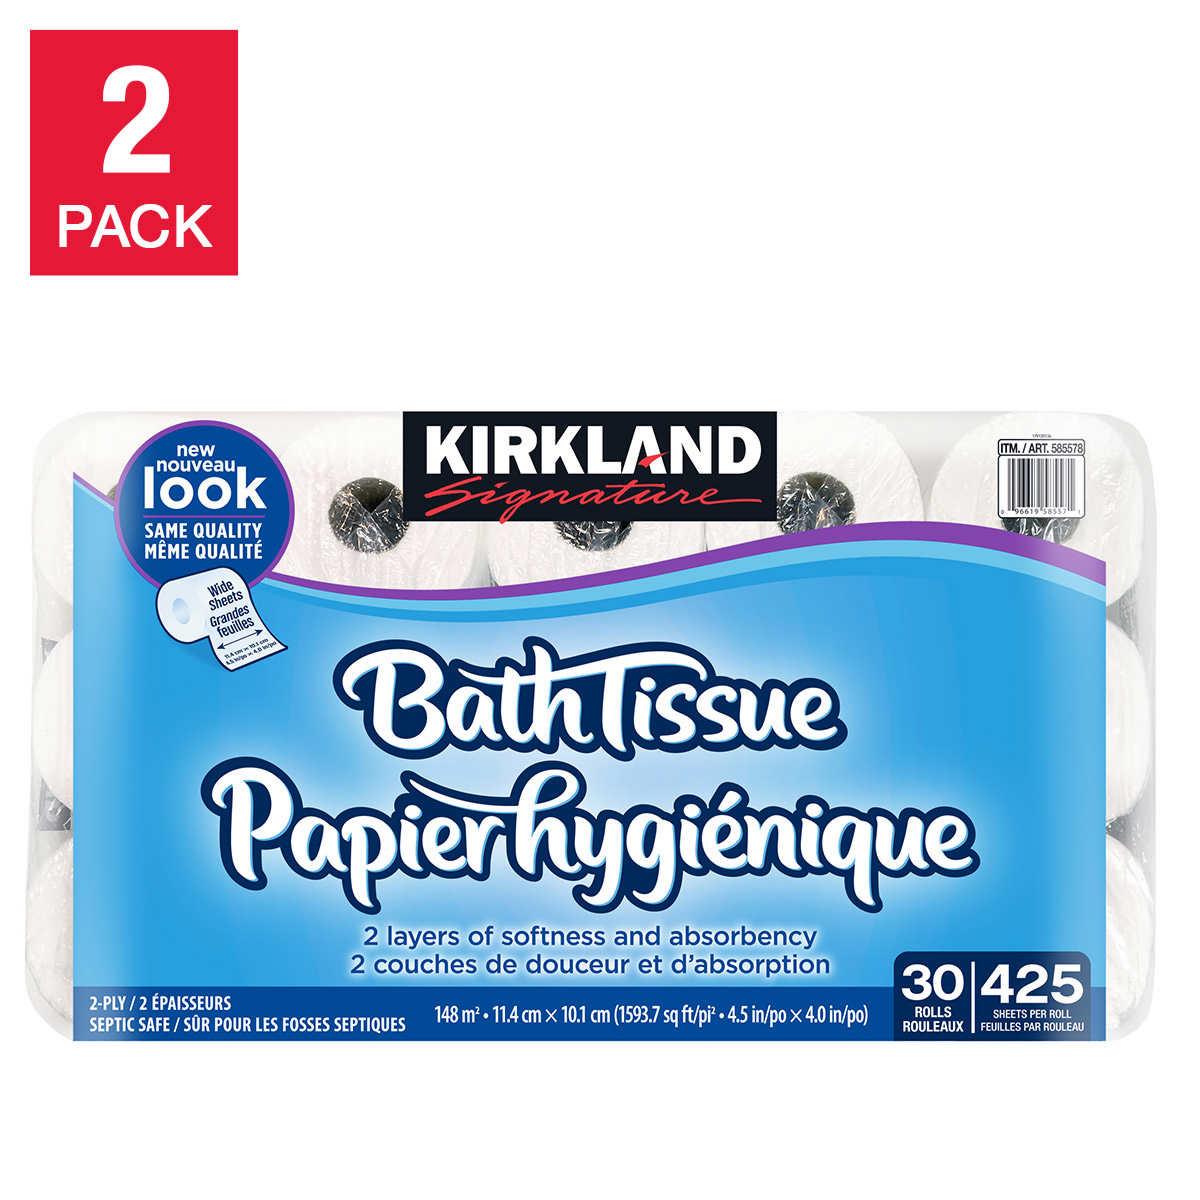 Kirkland Signature 2-ply Bathroom Tissue 30 x 425 Sheets 2-pack